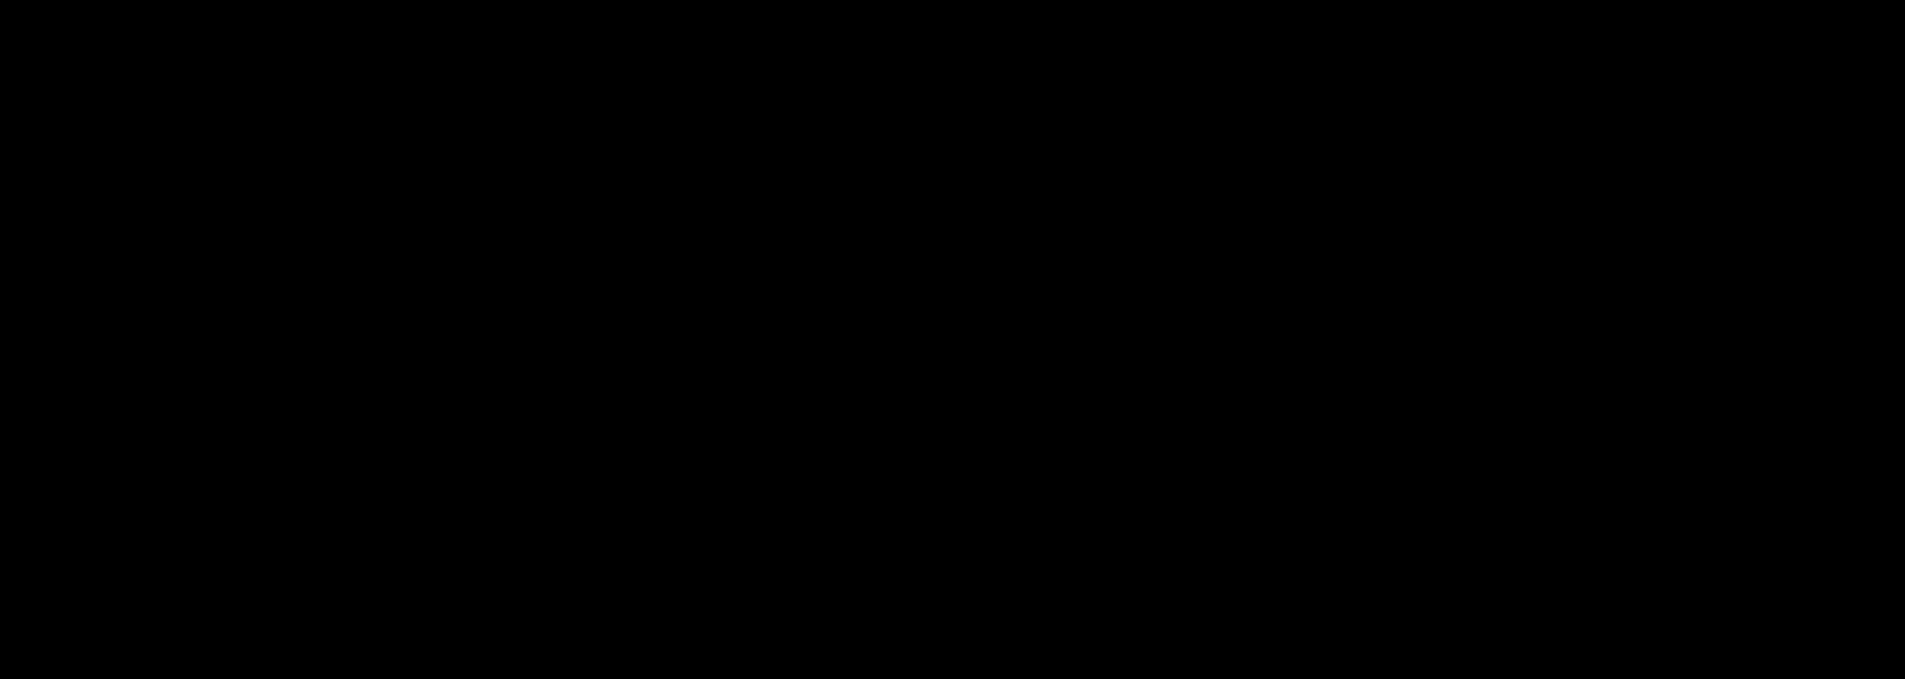 NCU_Skyline_2016_Black.png